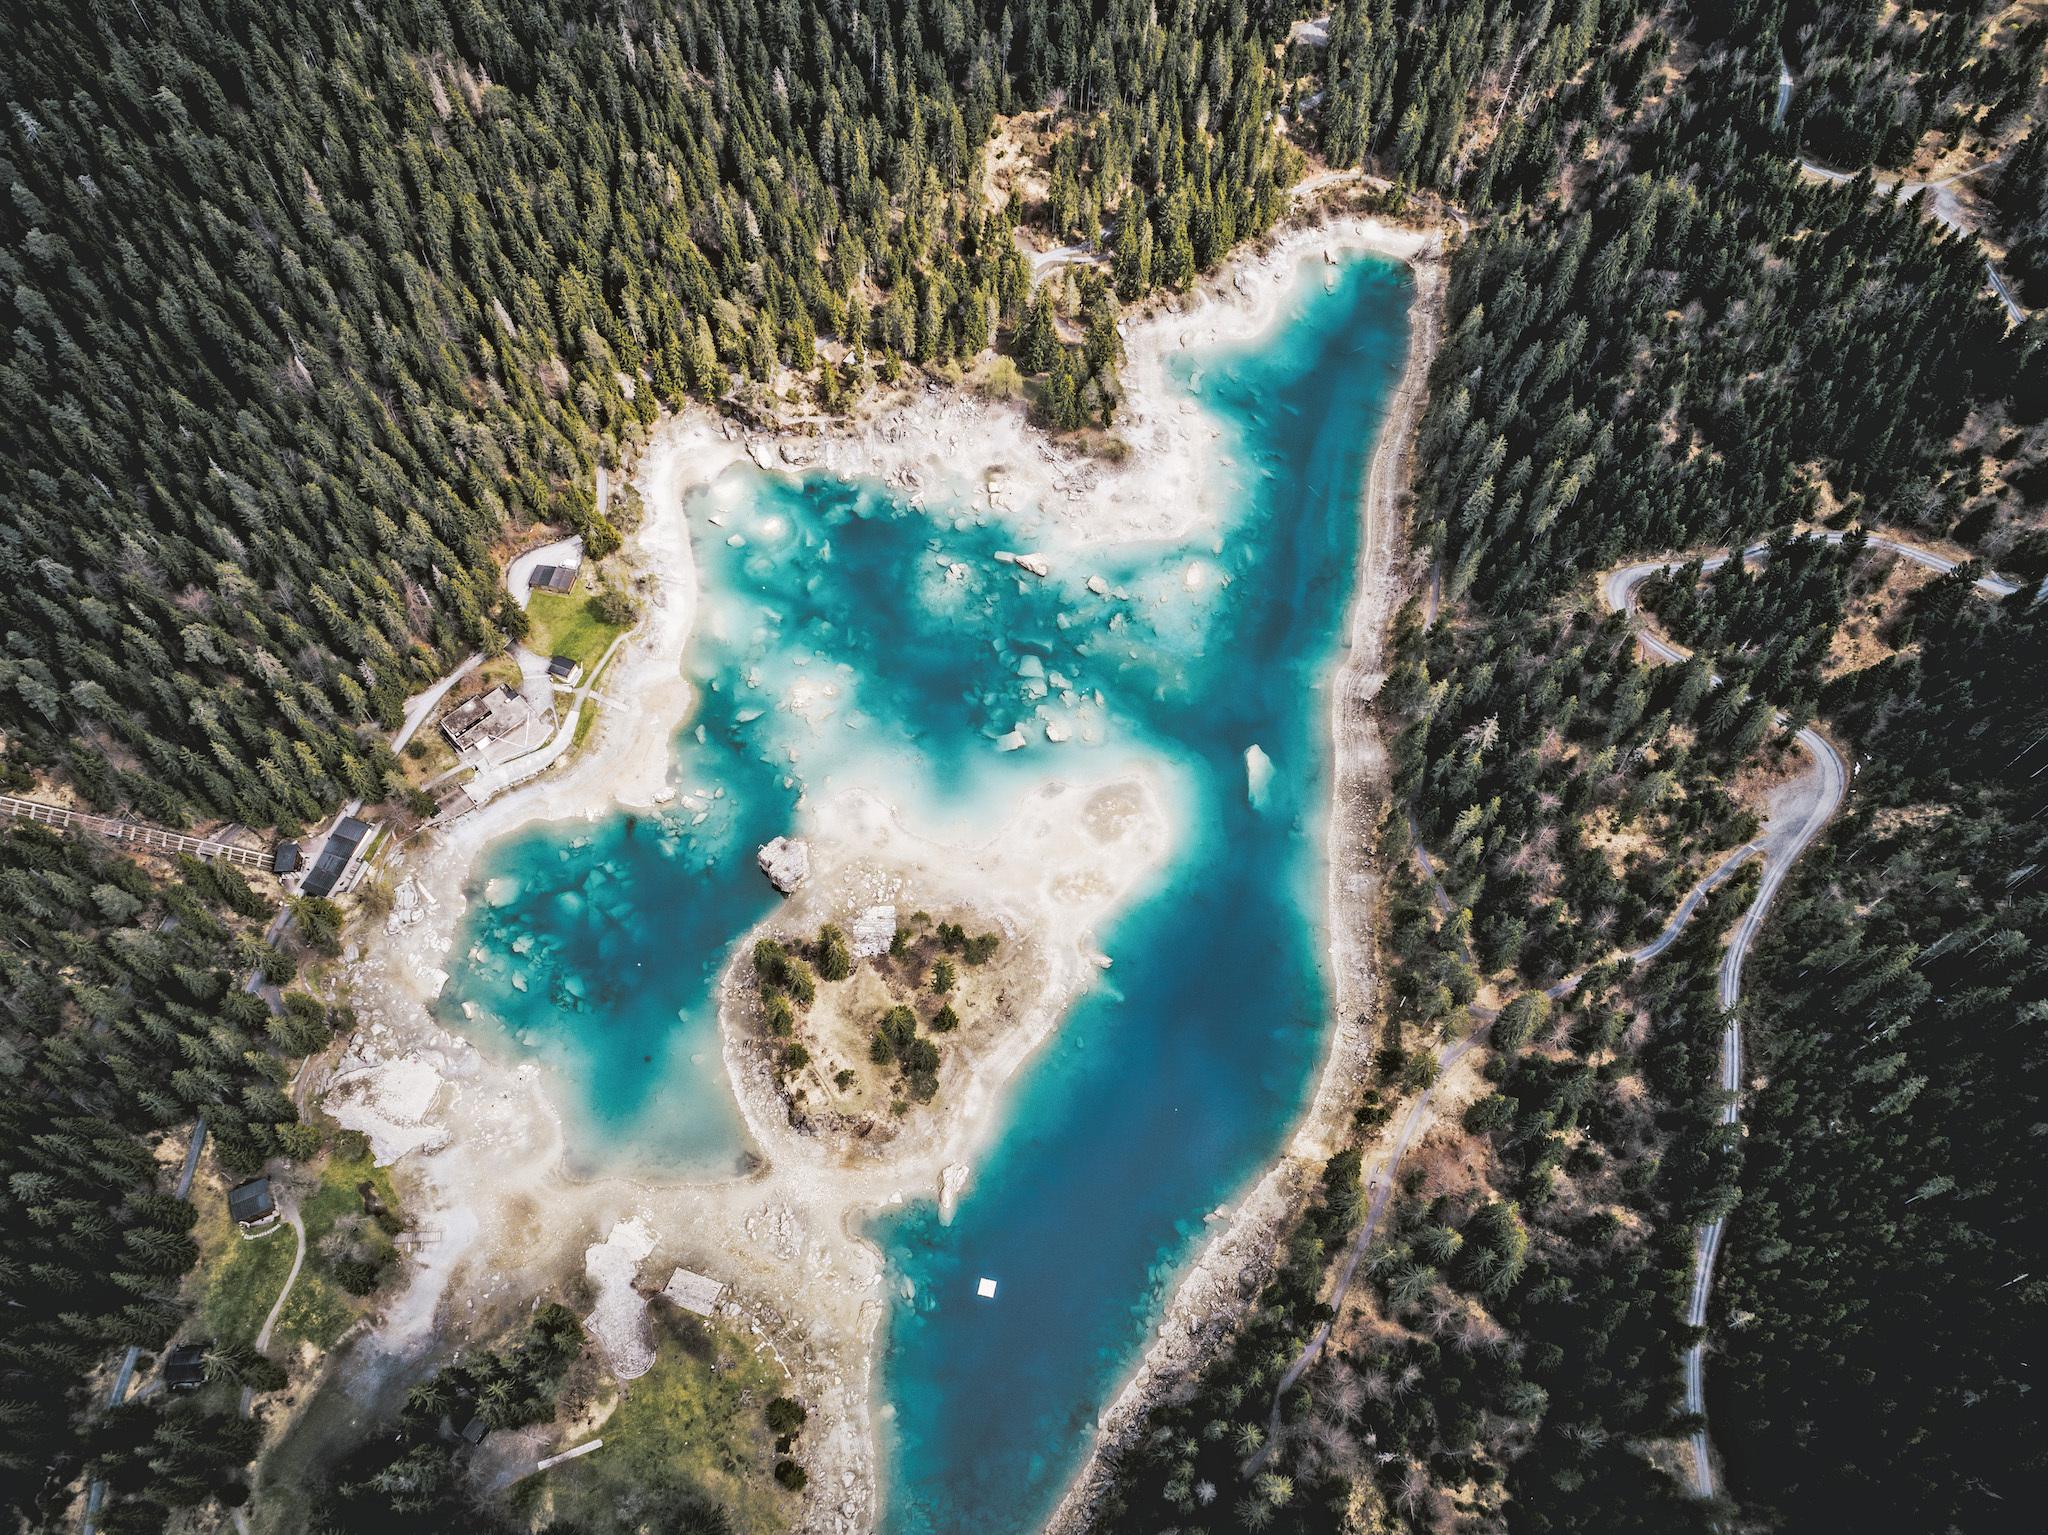 Island in Lake Cauma, Graubünden. for Swiss Islands Switzerland Tourism campaign. Do not reuse.